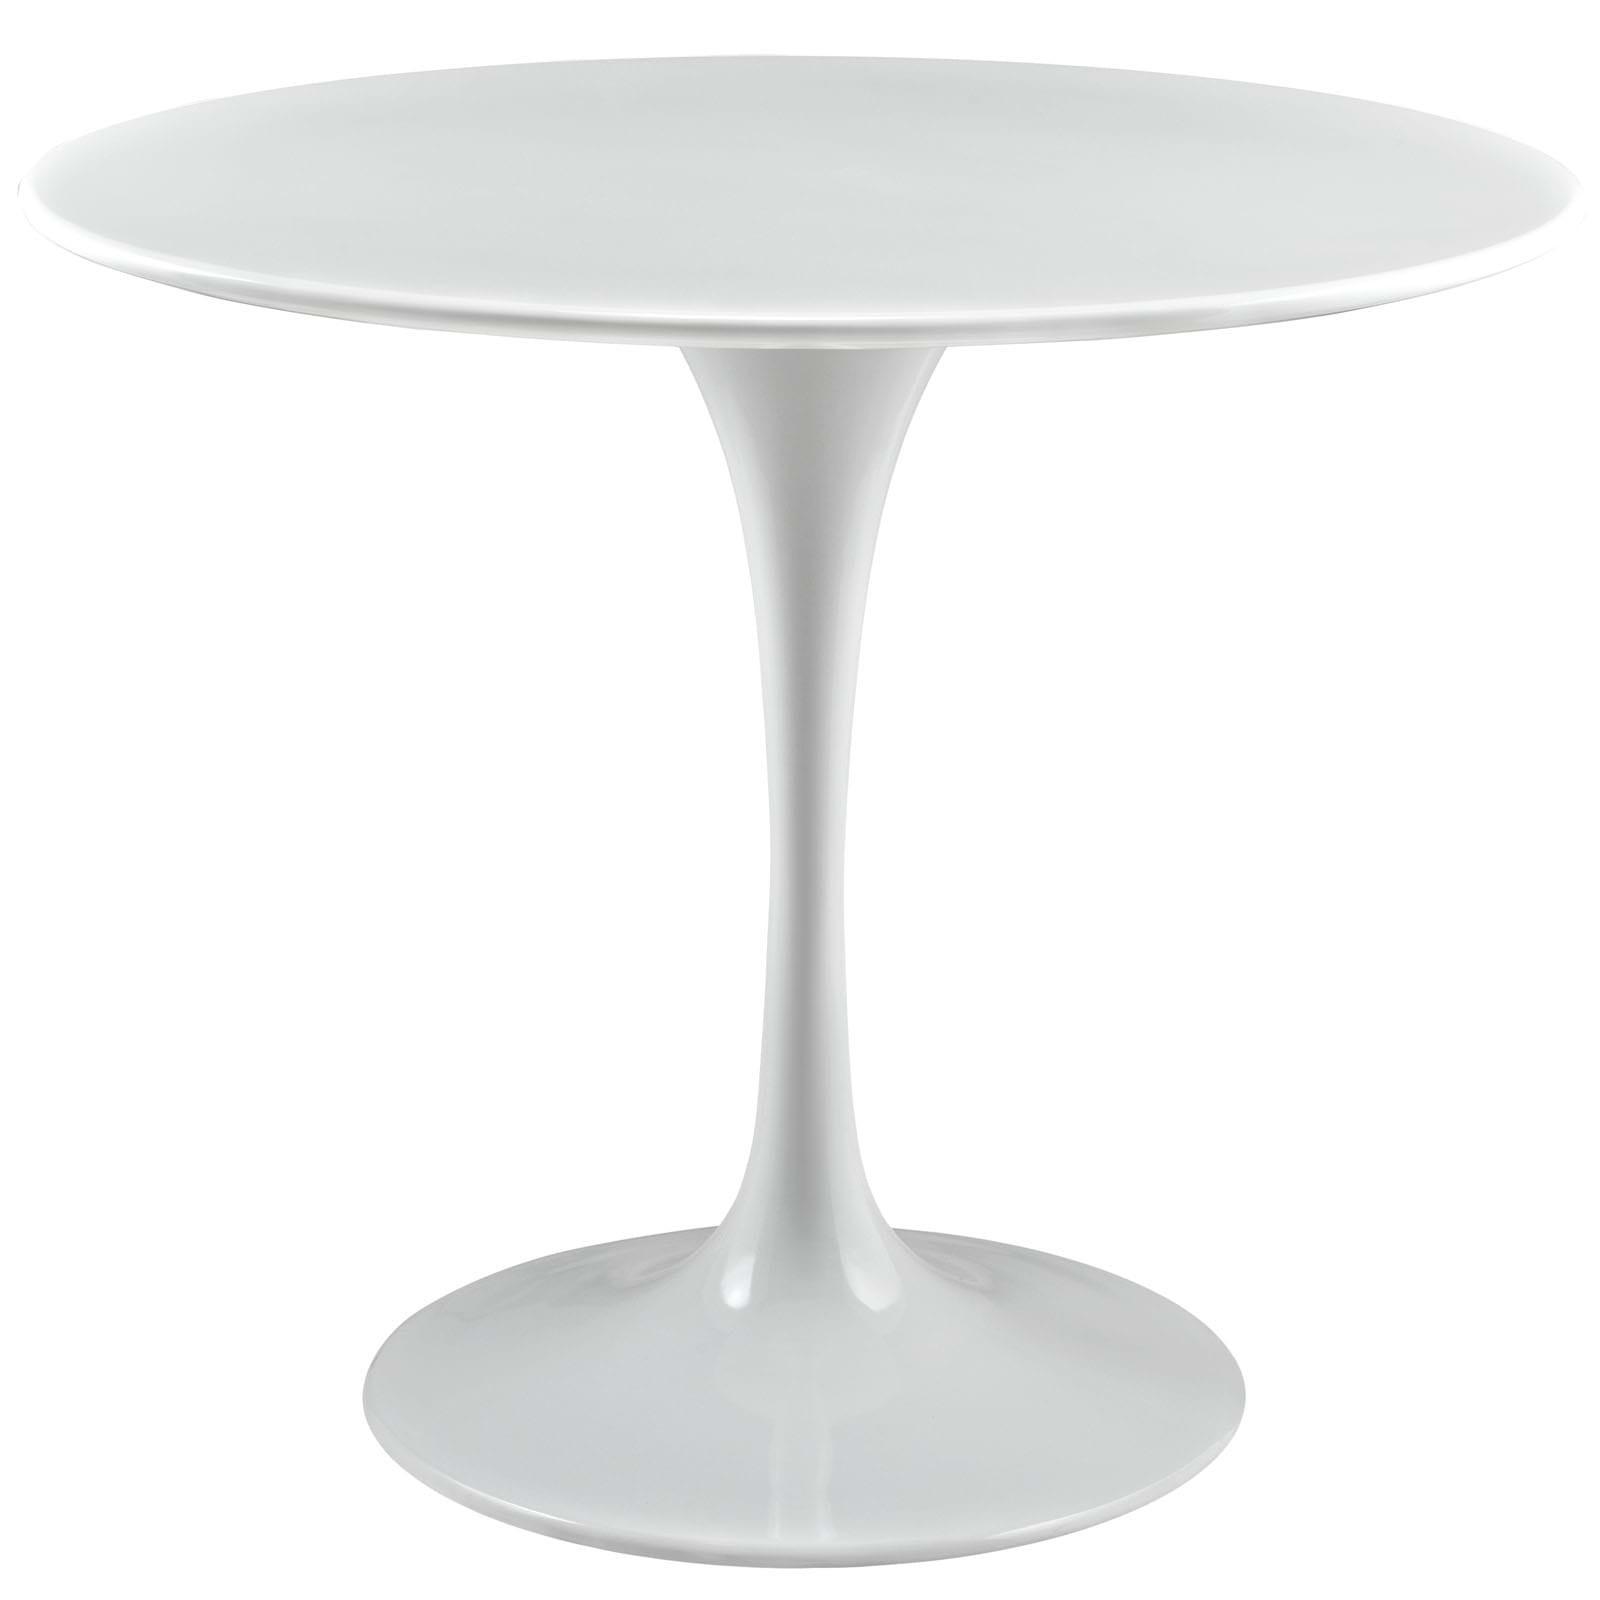 "Lippa 36"" Wood Top Dining Table"